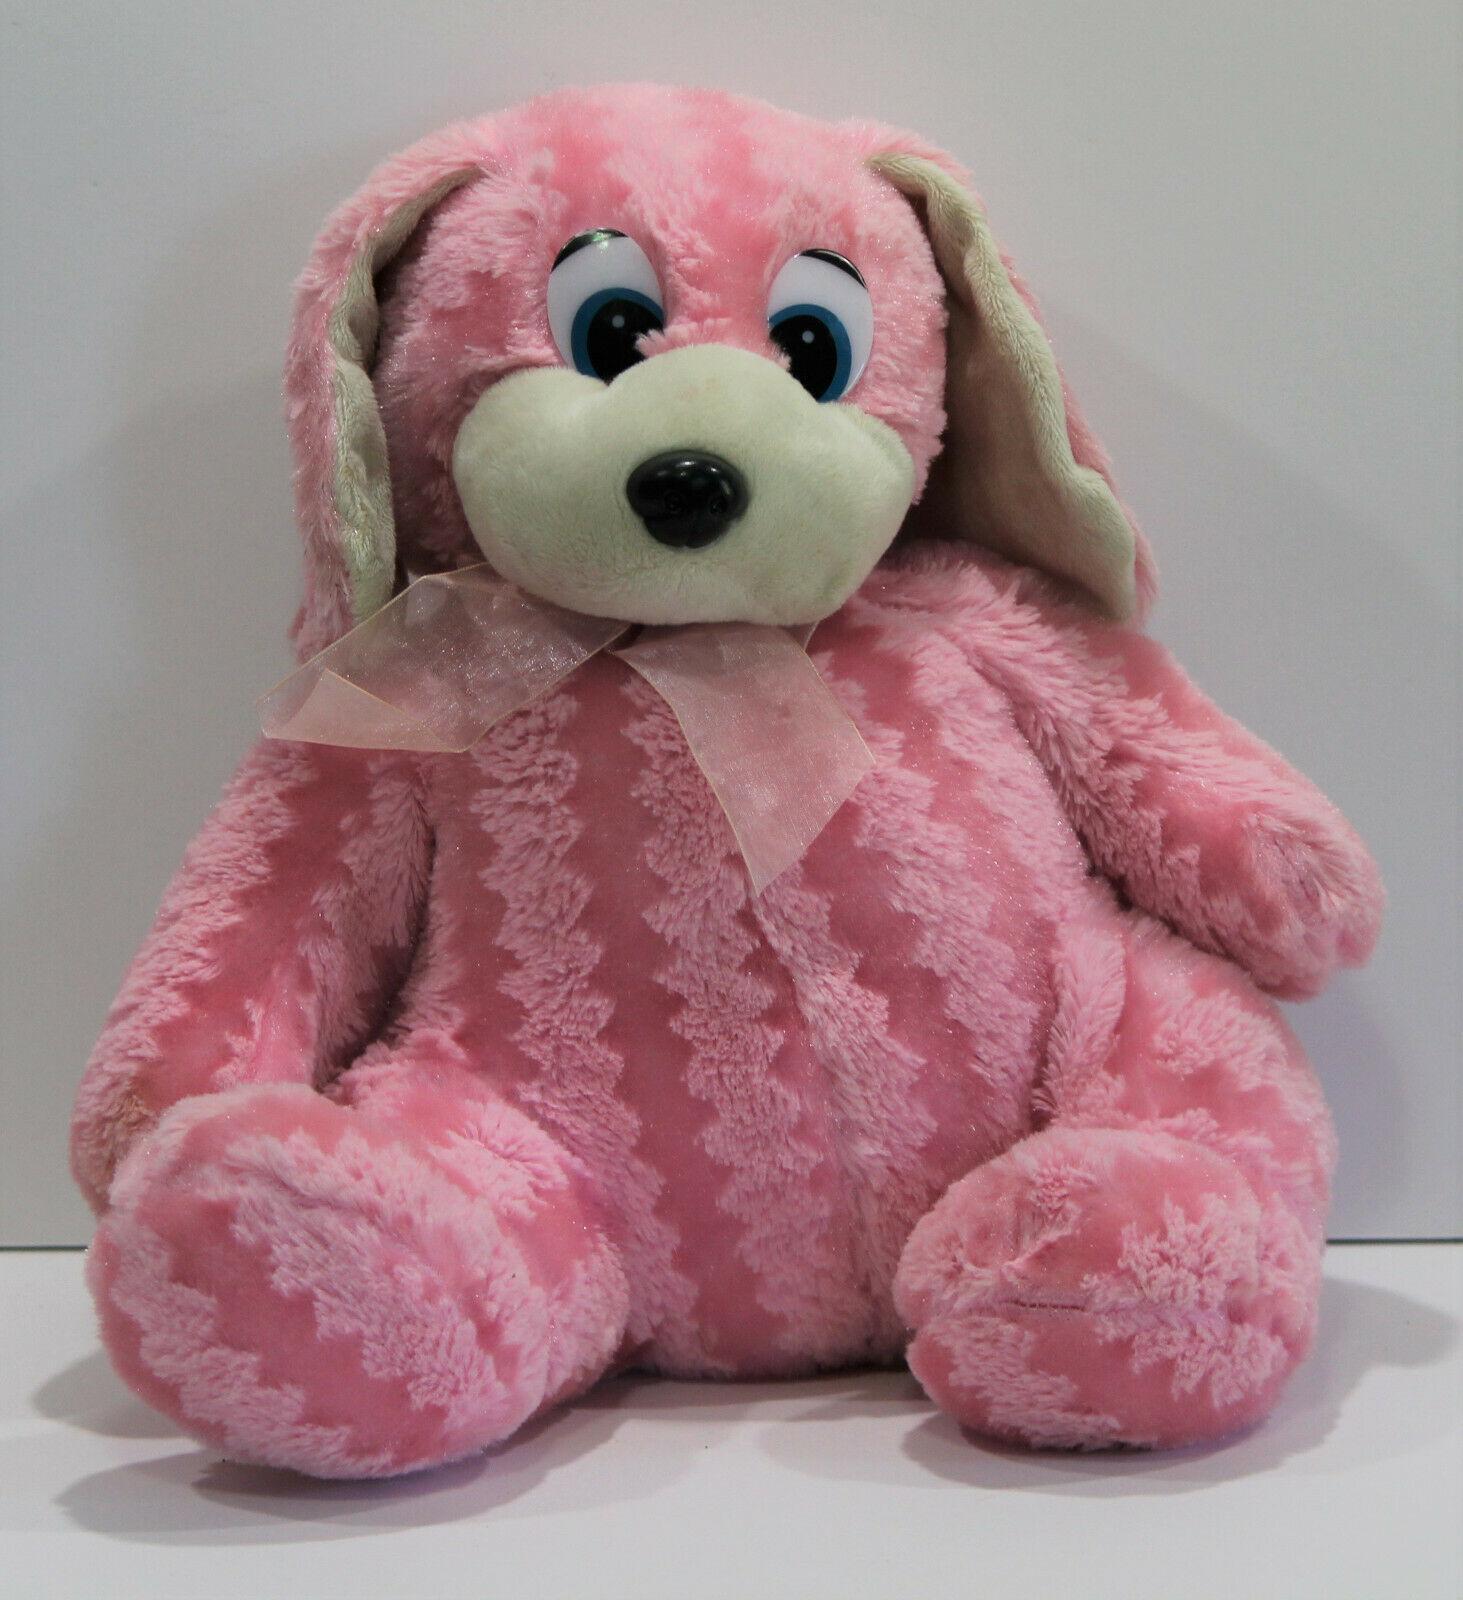 Kellytoy Kuddle Me Rabbit Bunny Big Eyes Pink Sparkle Vintage - $28.91